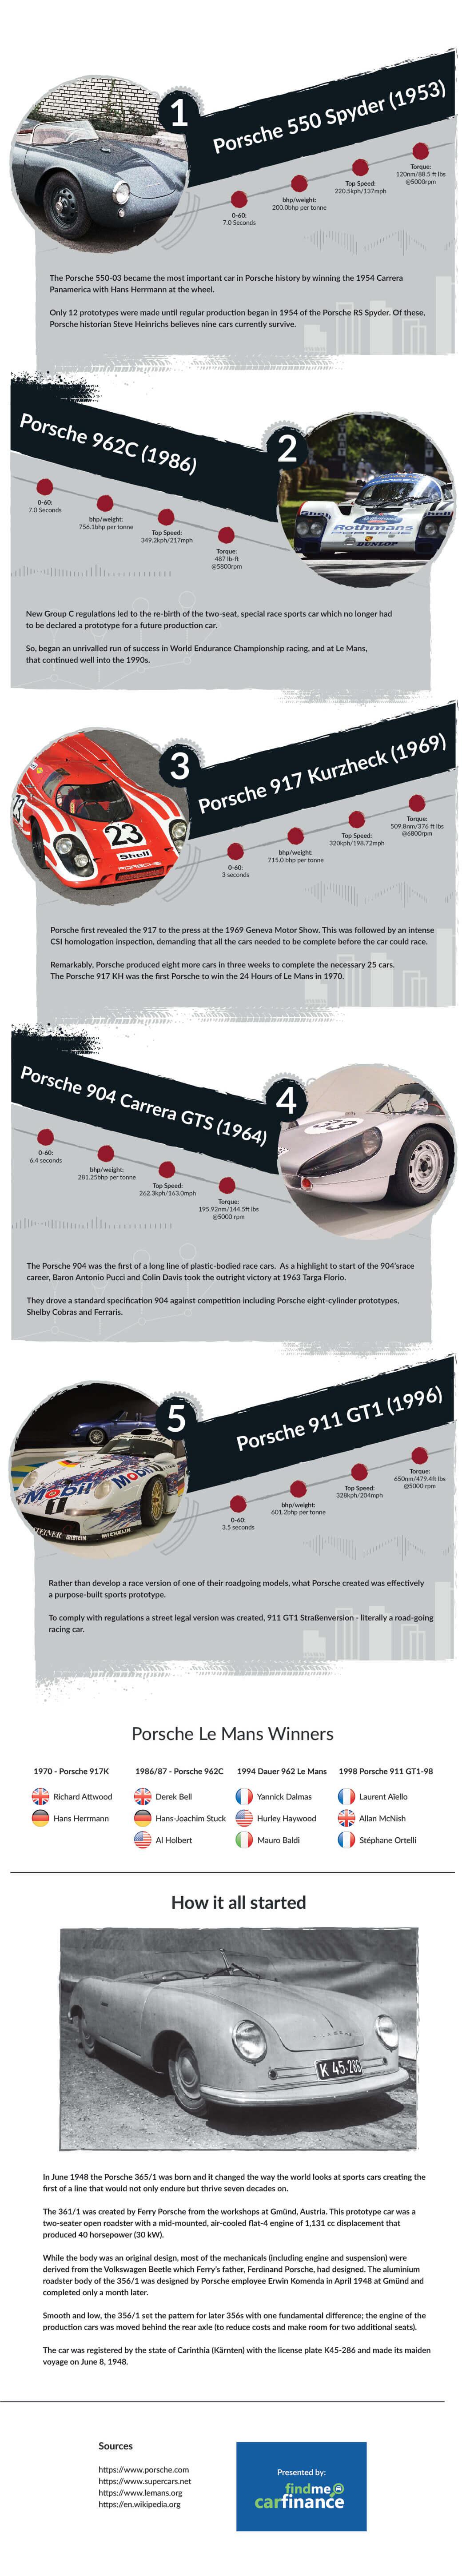 porsche_anniversary-infographic-plaza